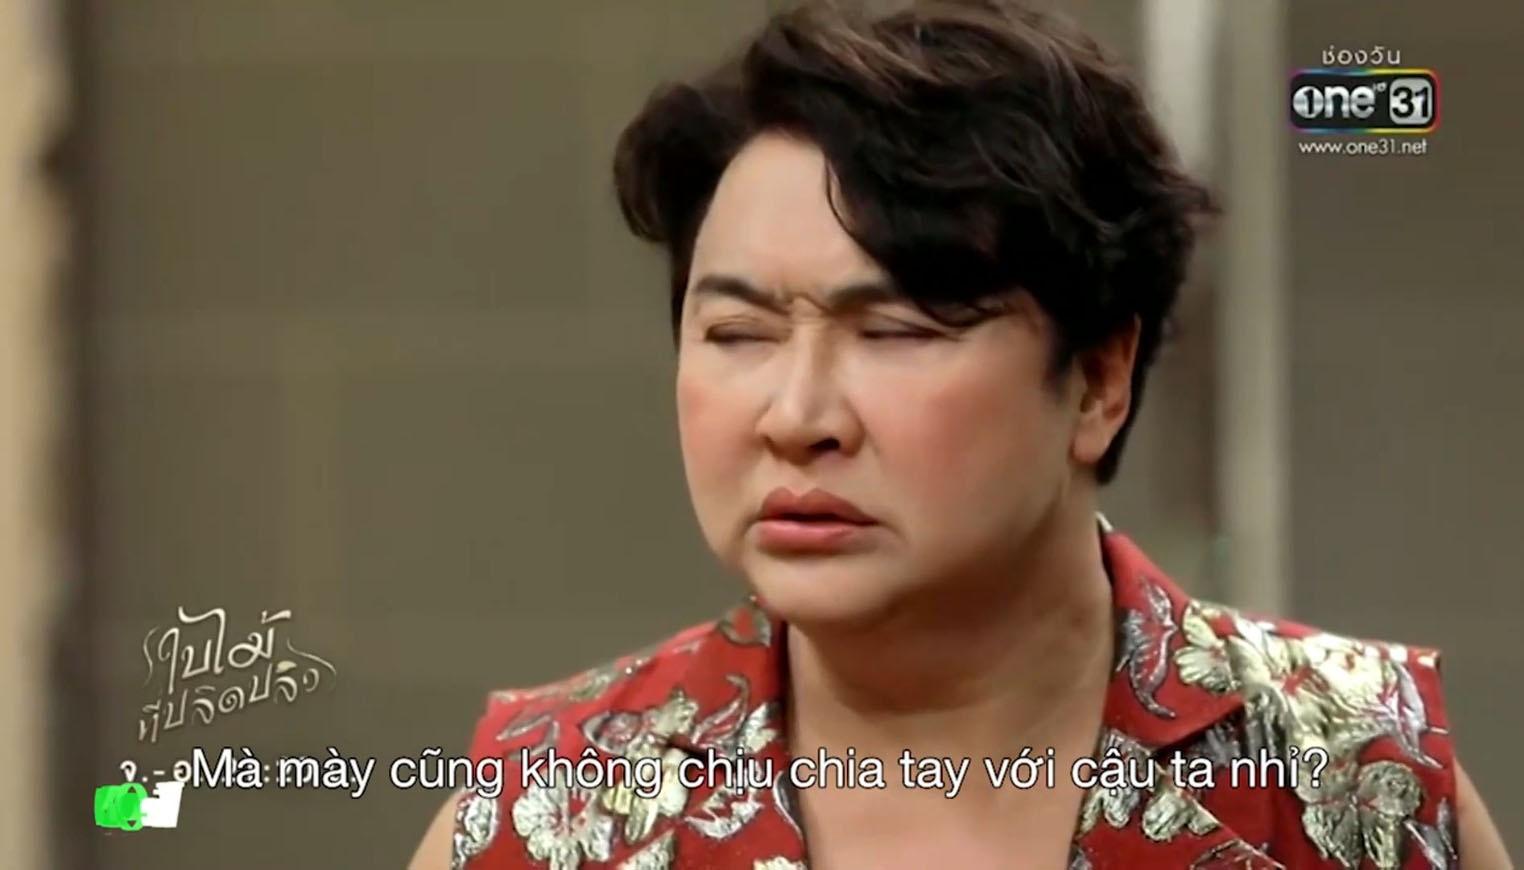 phim chiec la cuon bay tap 16 rungrong phat hien nira dung nhieu thuoc hormone